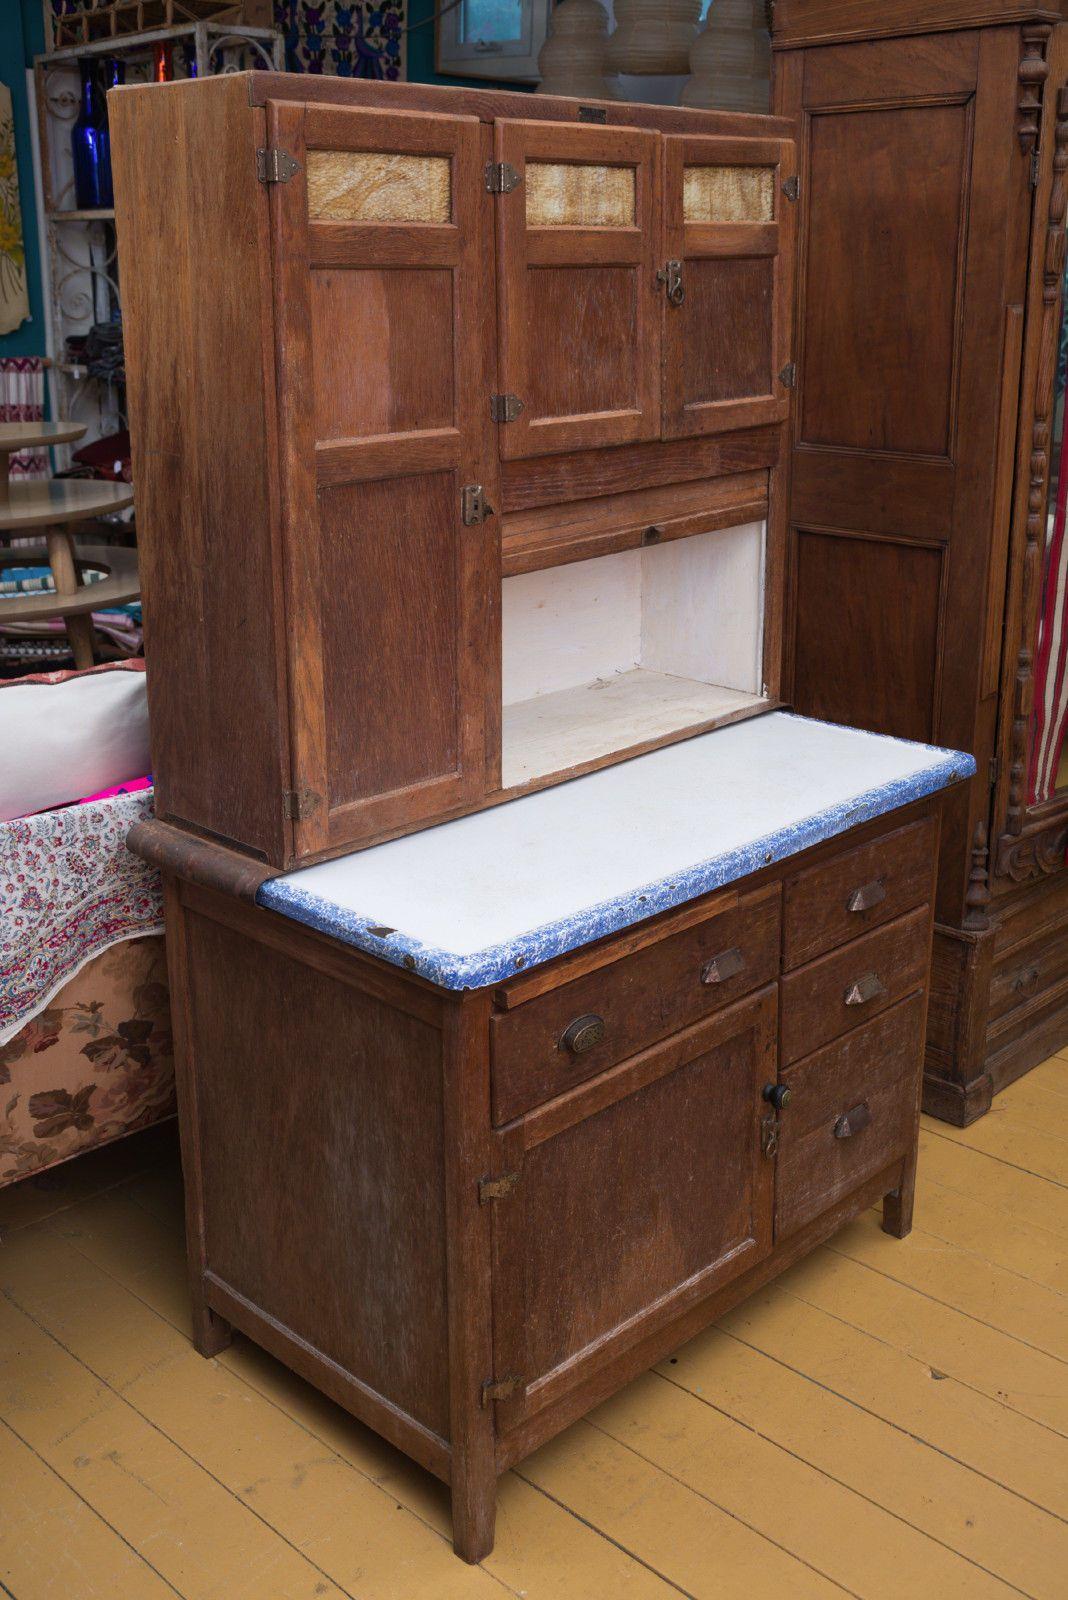 Best Kitchen Gallery: Antique Early 1900's Hoosier Style Wilson Kitchen Cabi Hoosier of Wilson Antique Kitchen Cabinet on rachelxblog.com